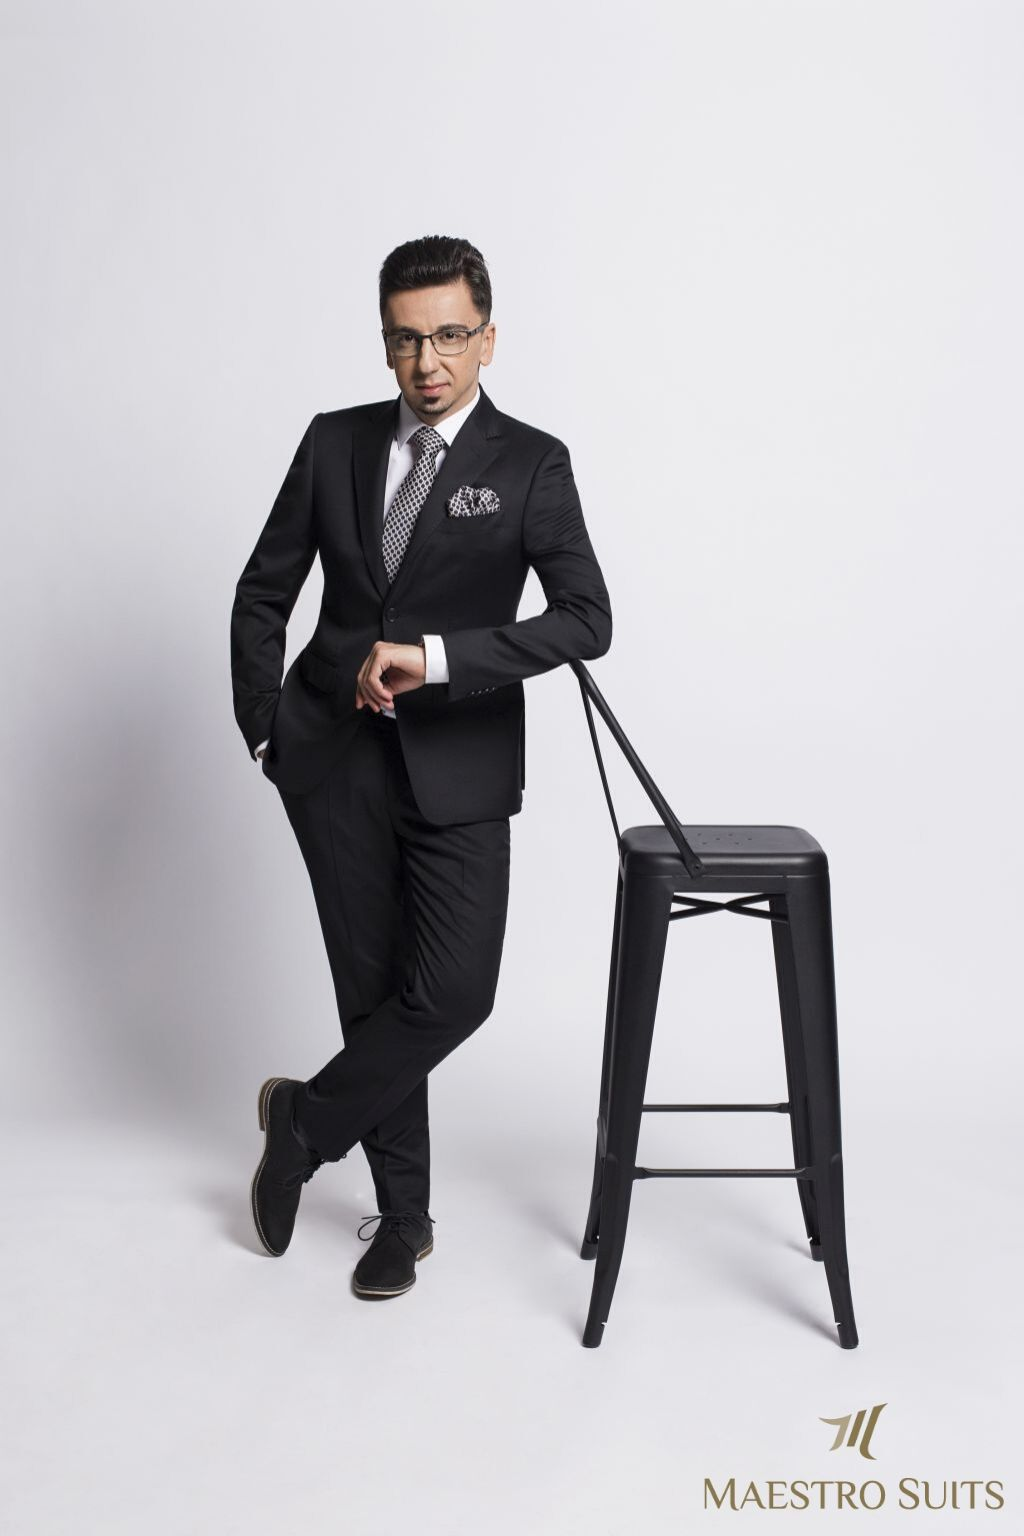 zvonko_komsic_maestro_suits (1)